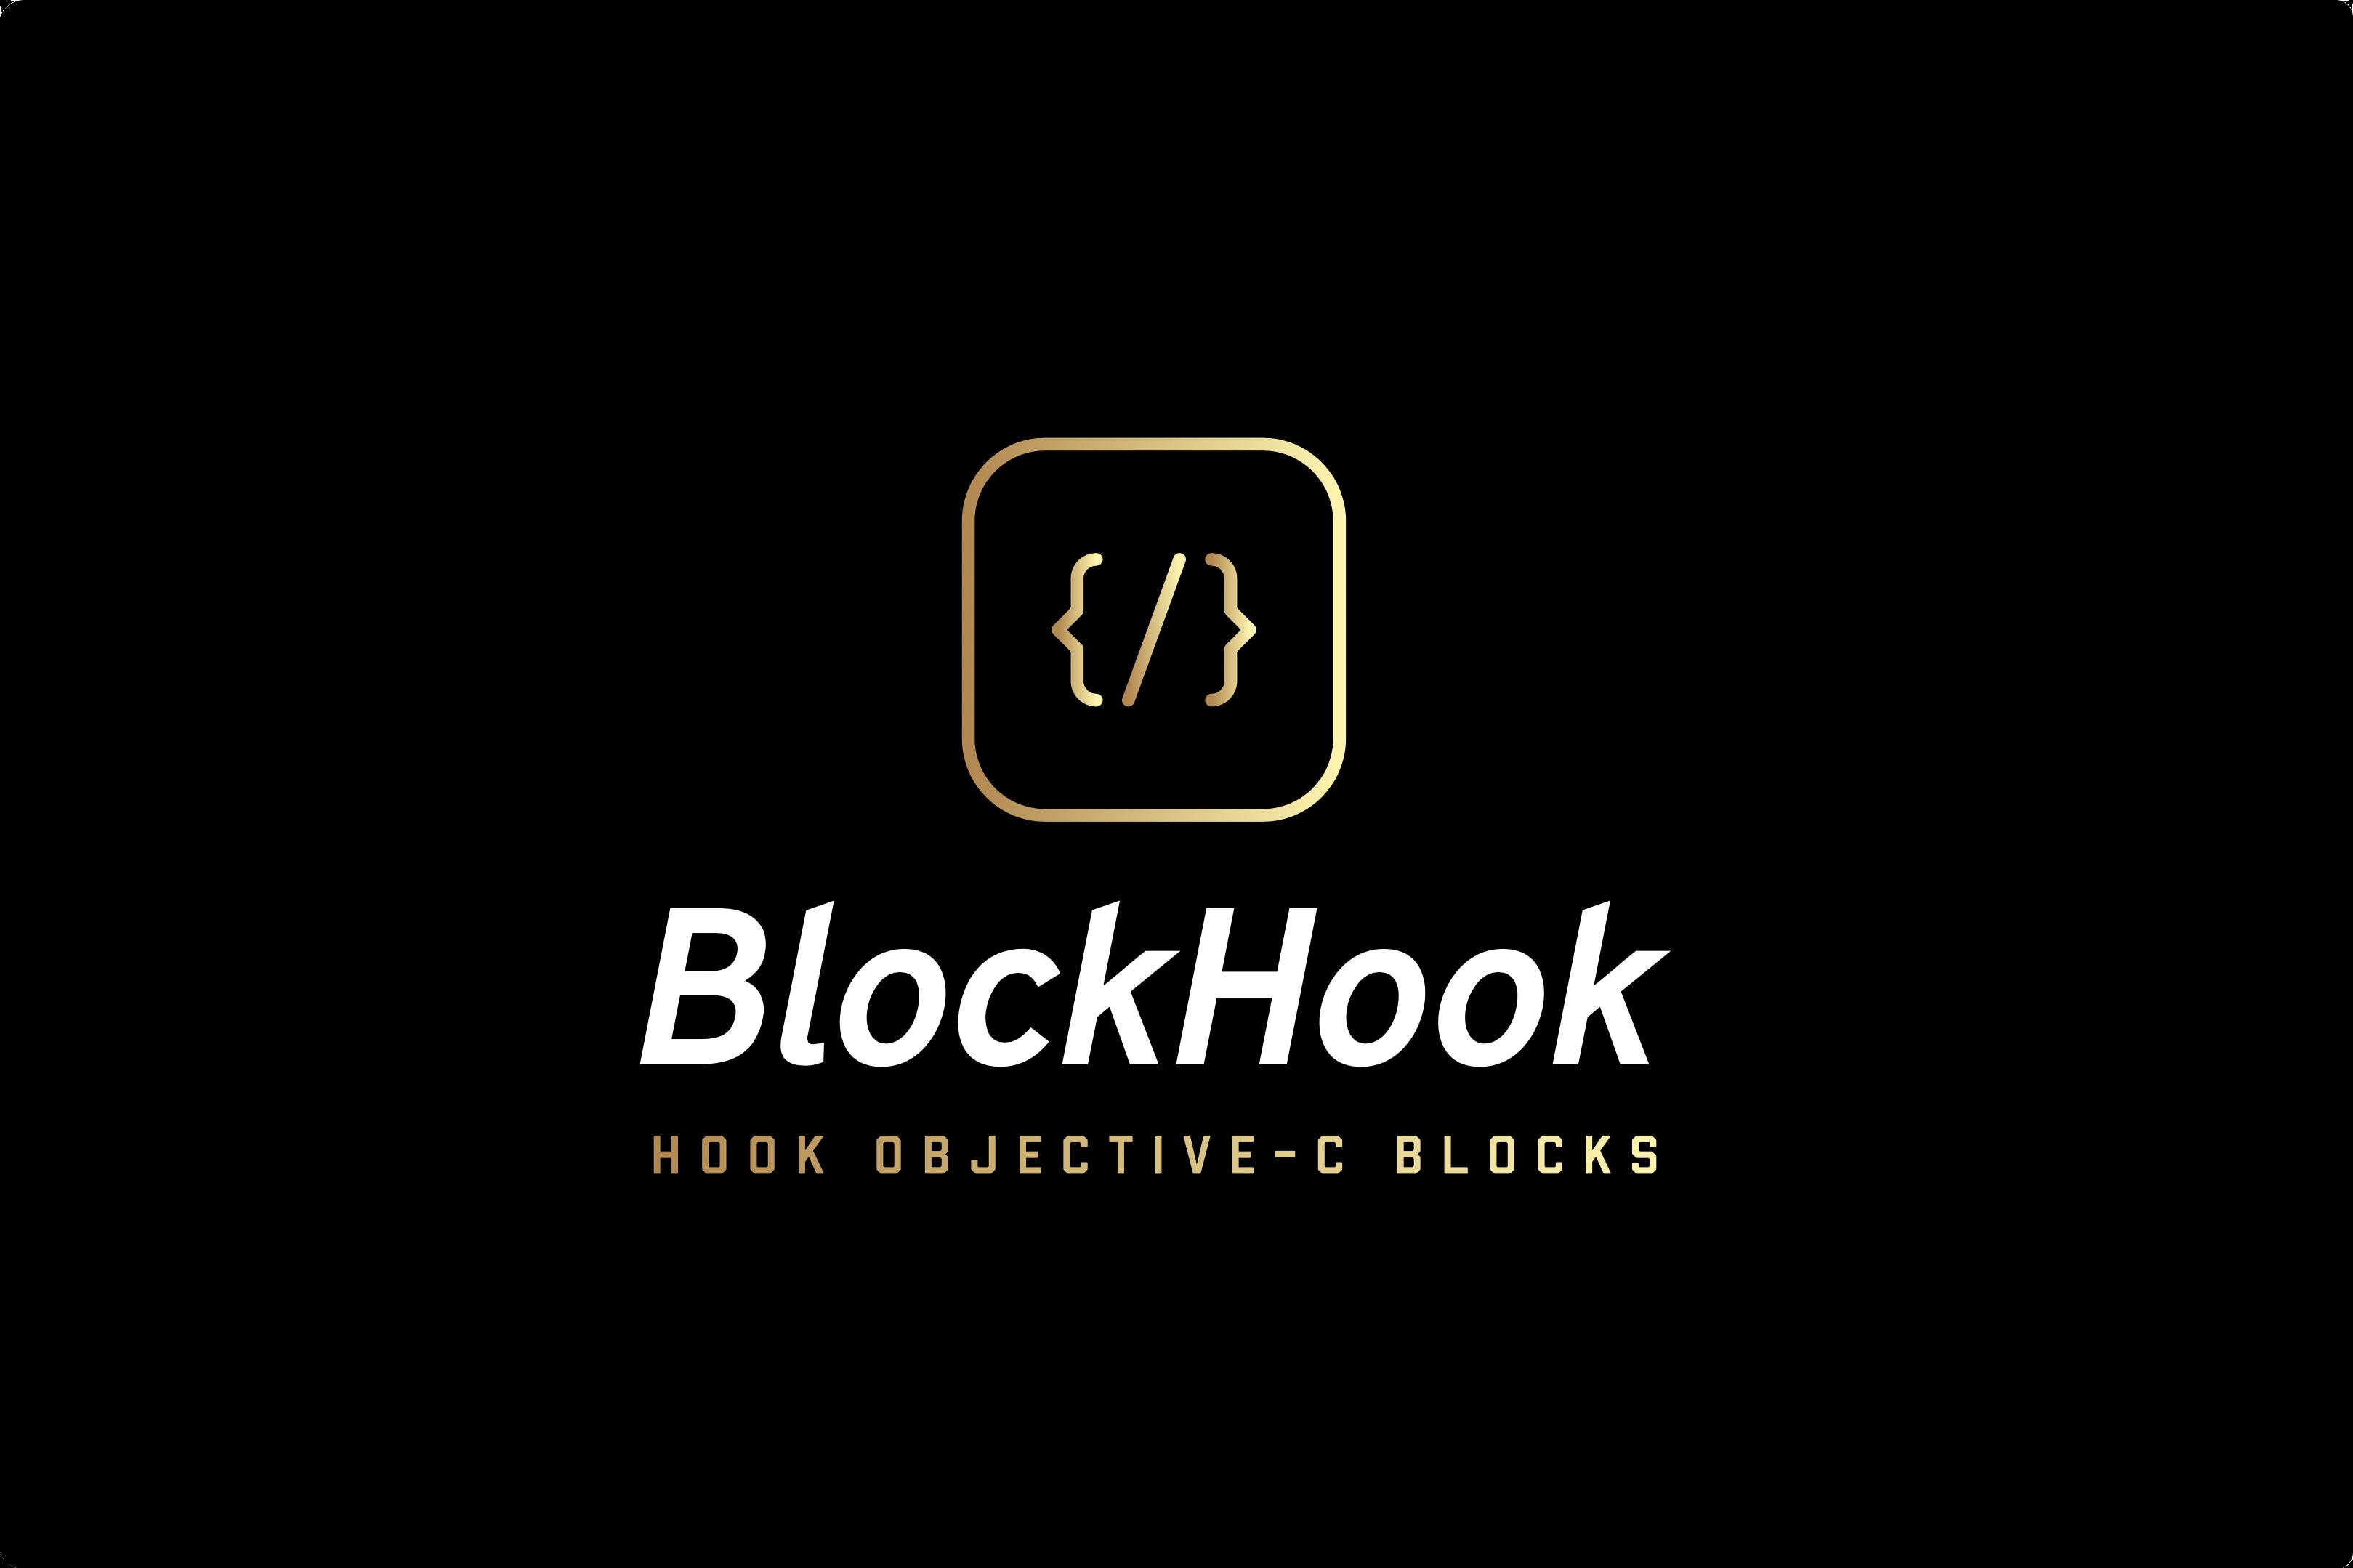 BlockHook